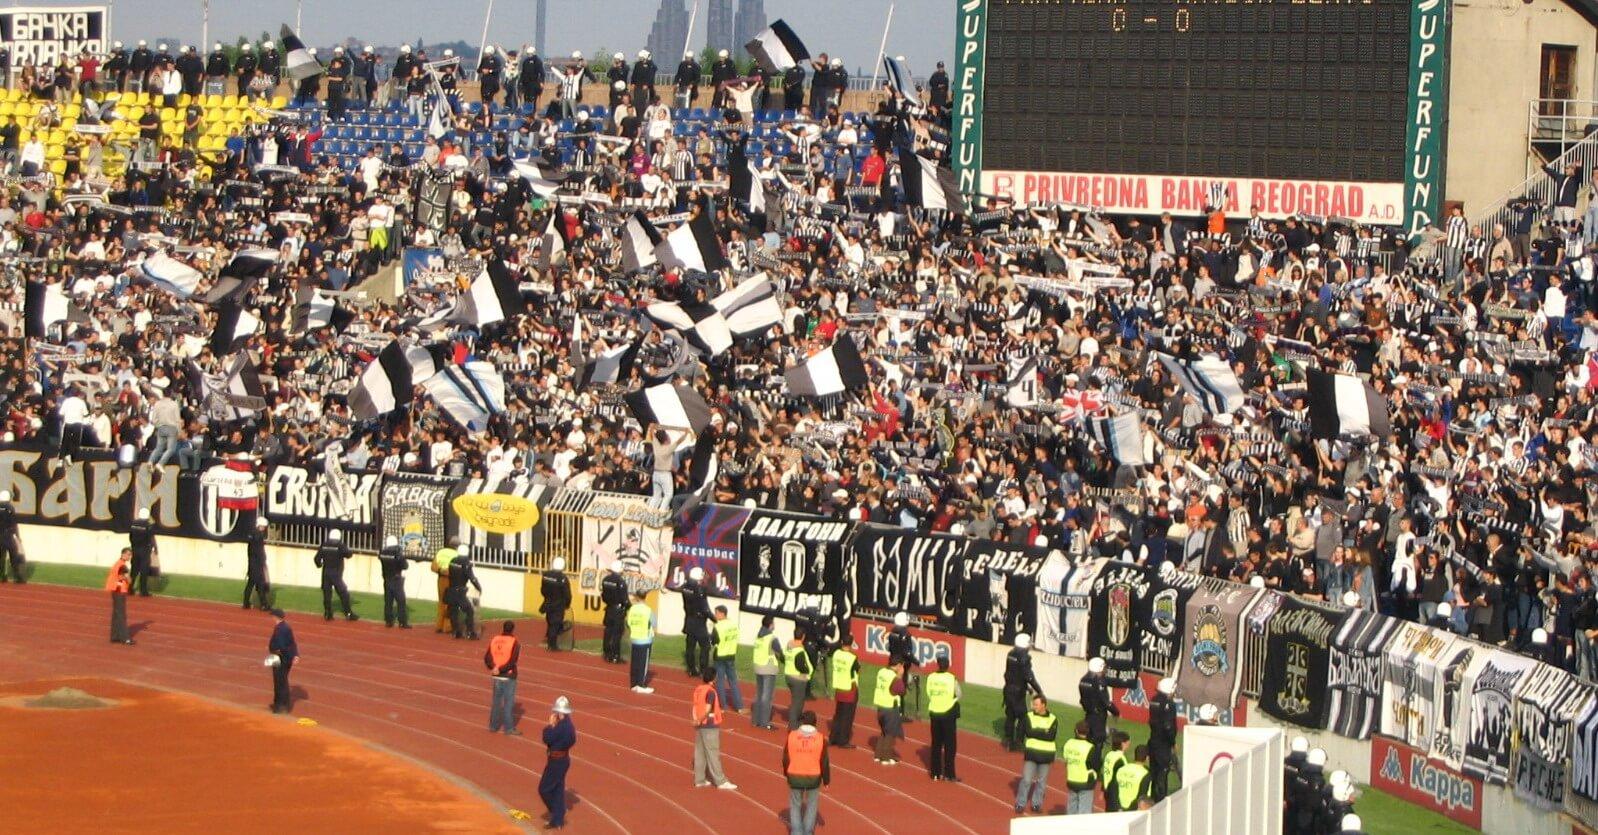 Stadion Partizana Fans